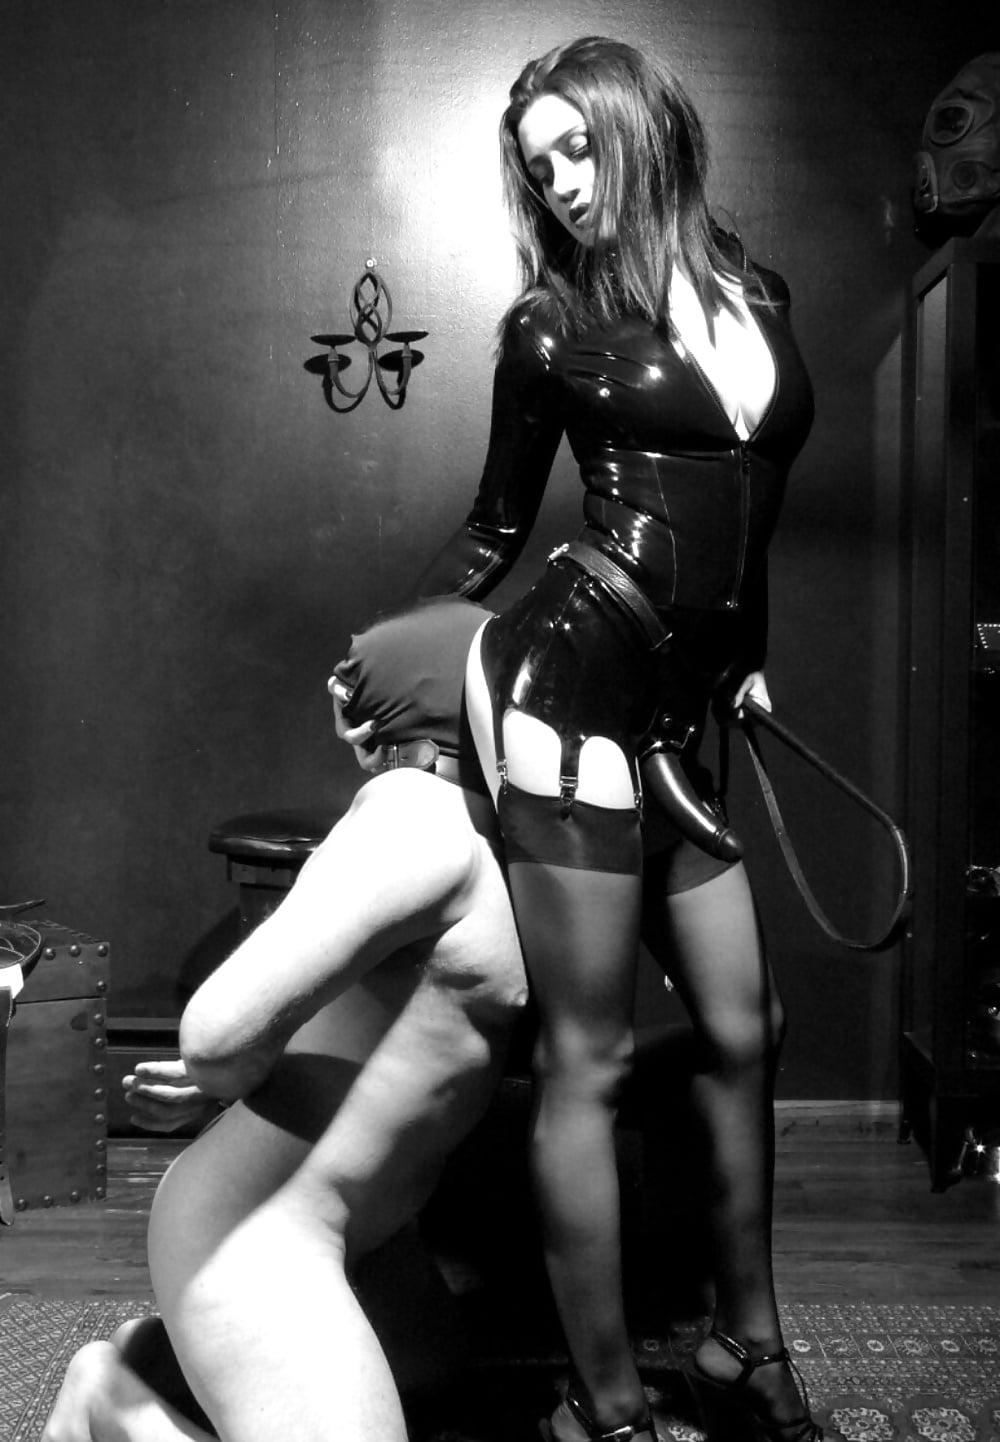 dominatrix-femdom-guide-emo-girl-rough